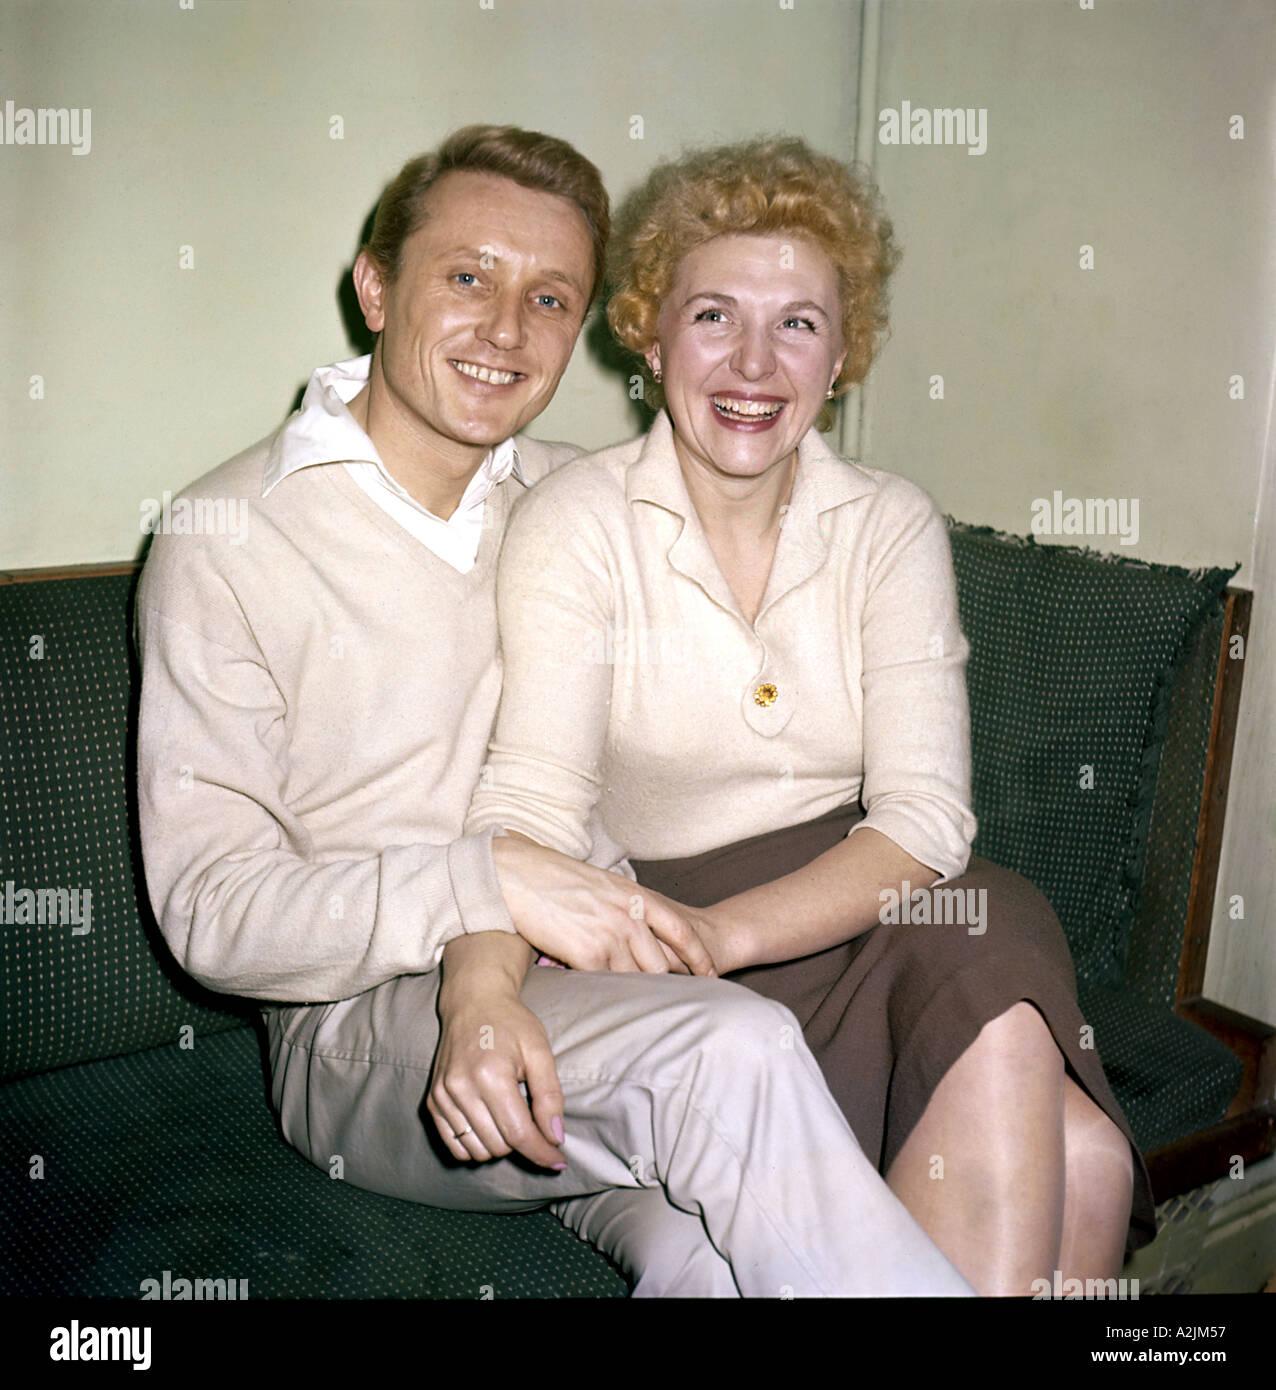 GARY MILLER Uk-Pop-Sängerin 1924 1968 hier mit seiner Frau Stockbild